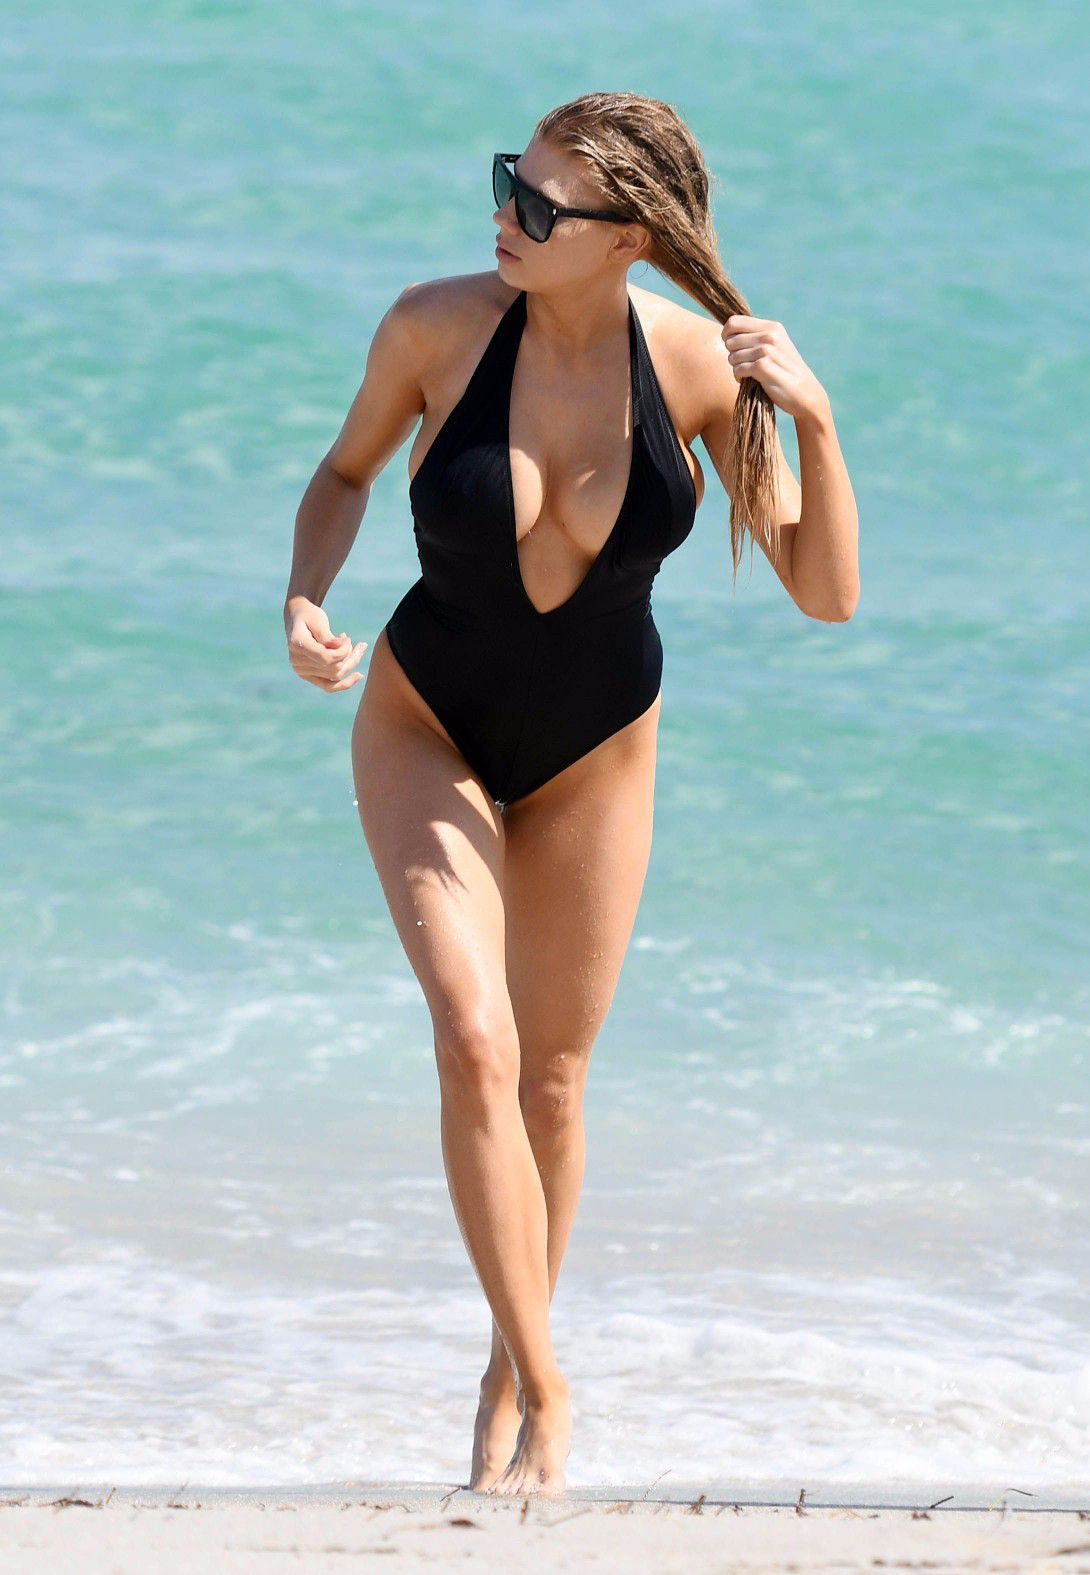 charlotte-mckinney-nipple-slip-at-the-beach-in-miami-20